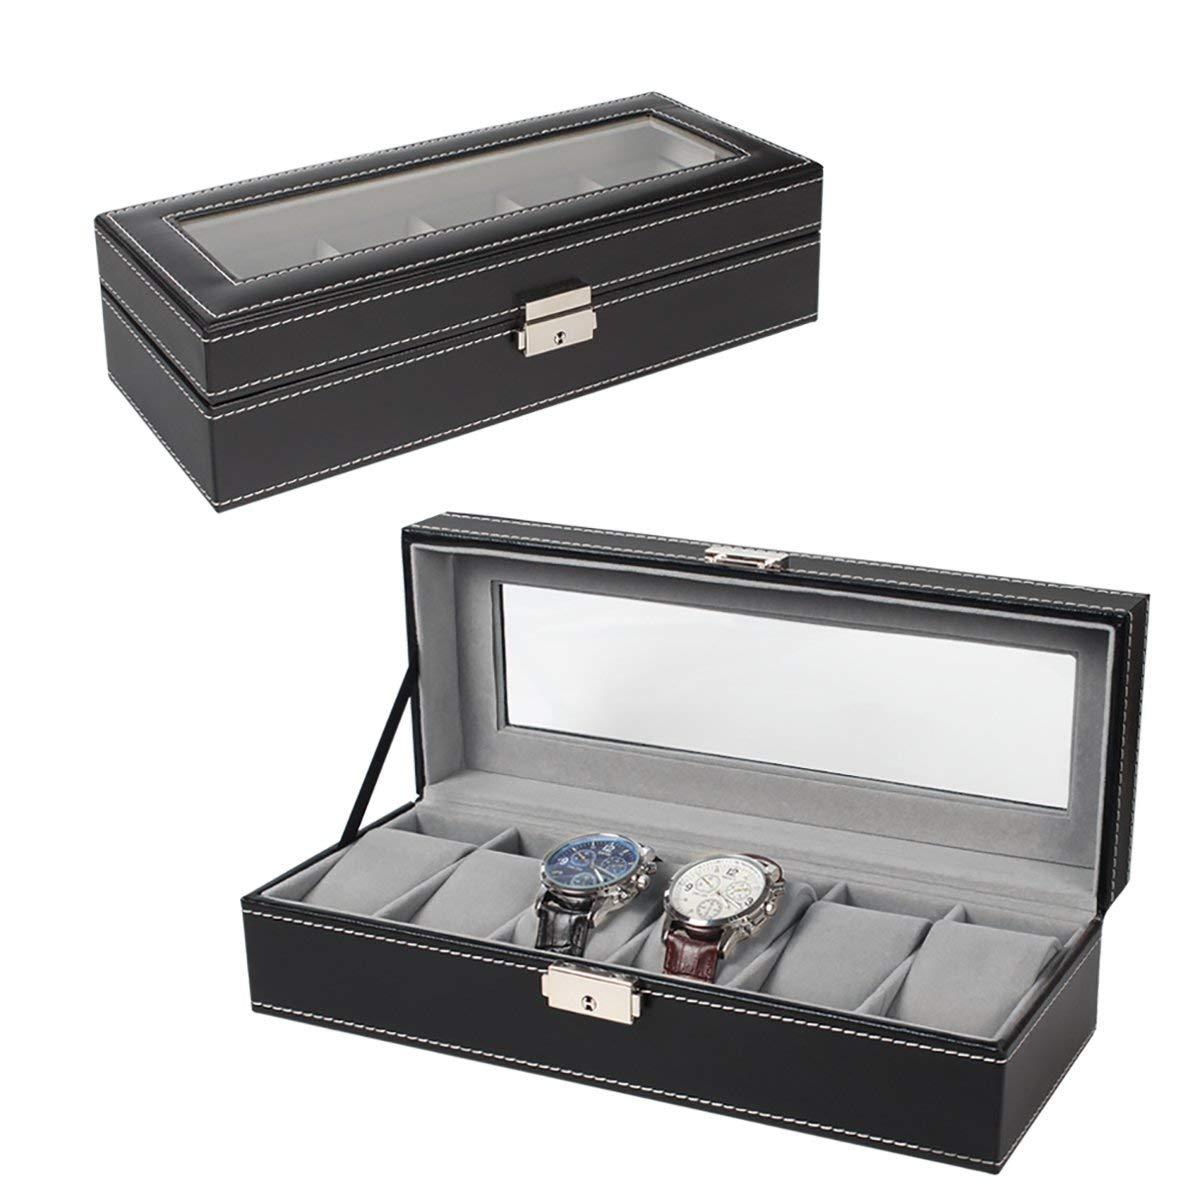 NEX 6 slot leather watch box $9.44